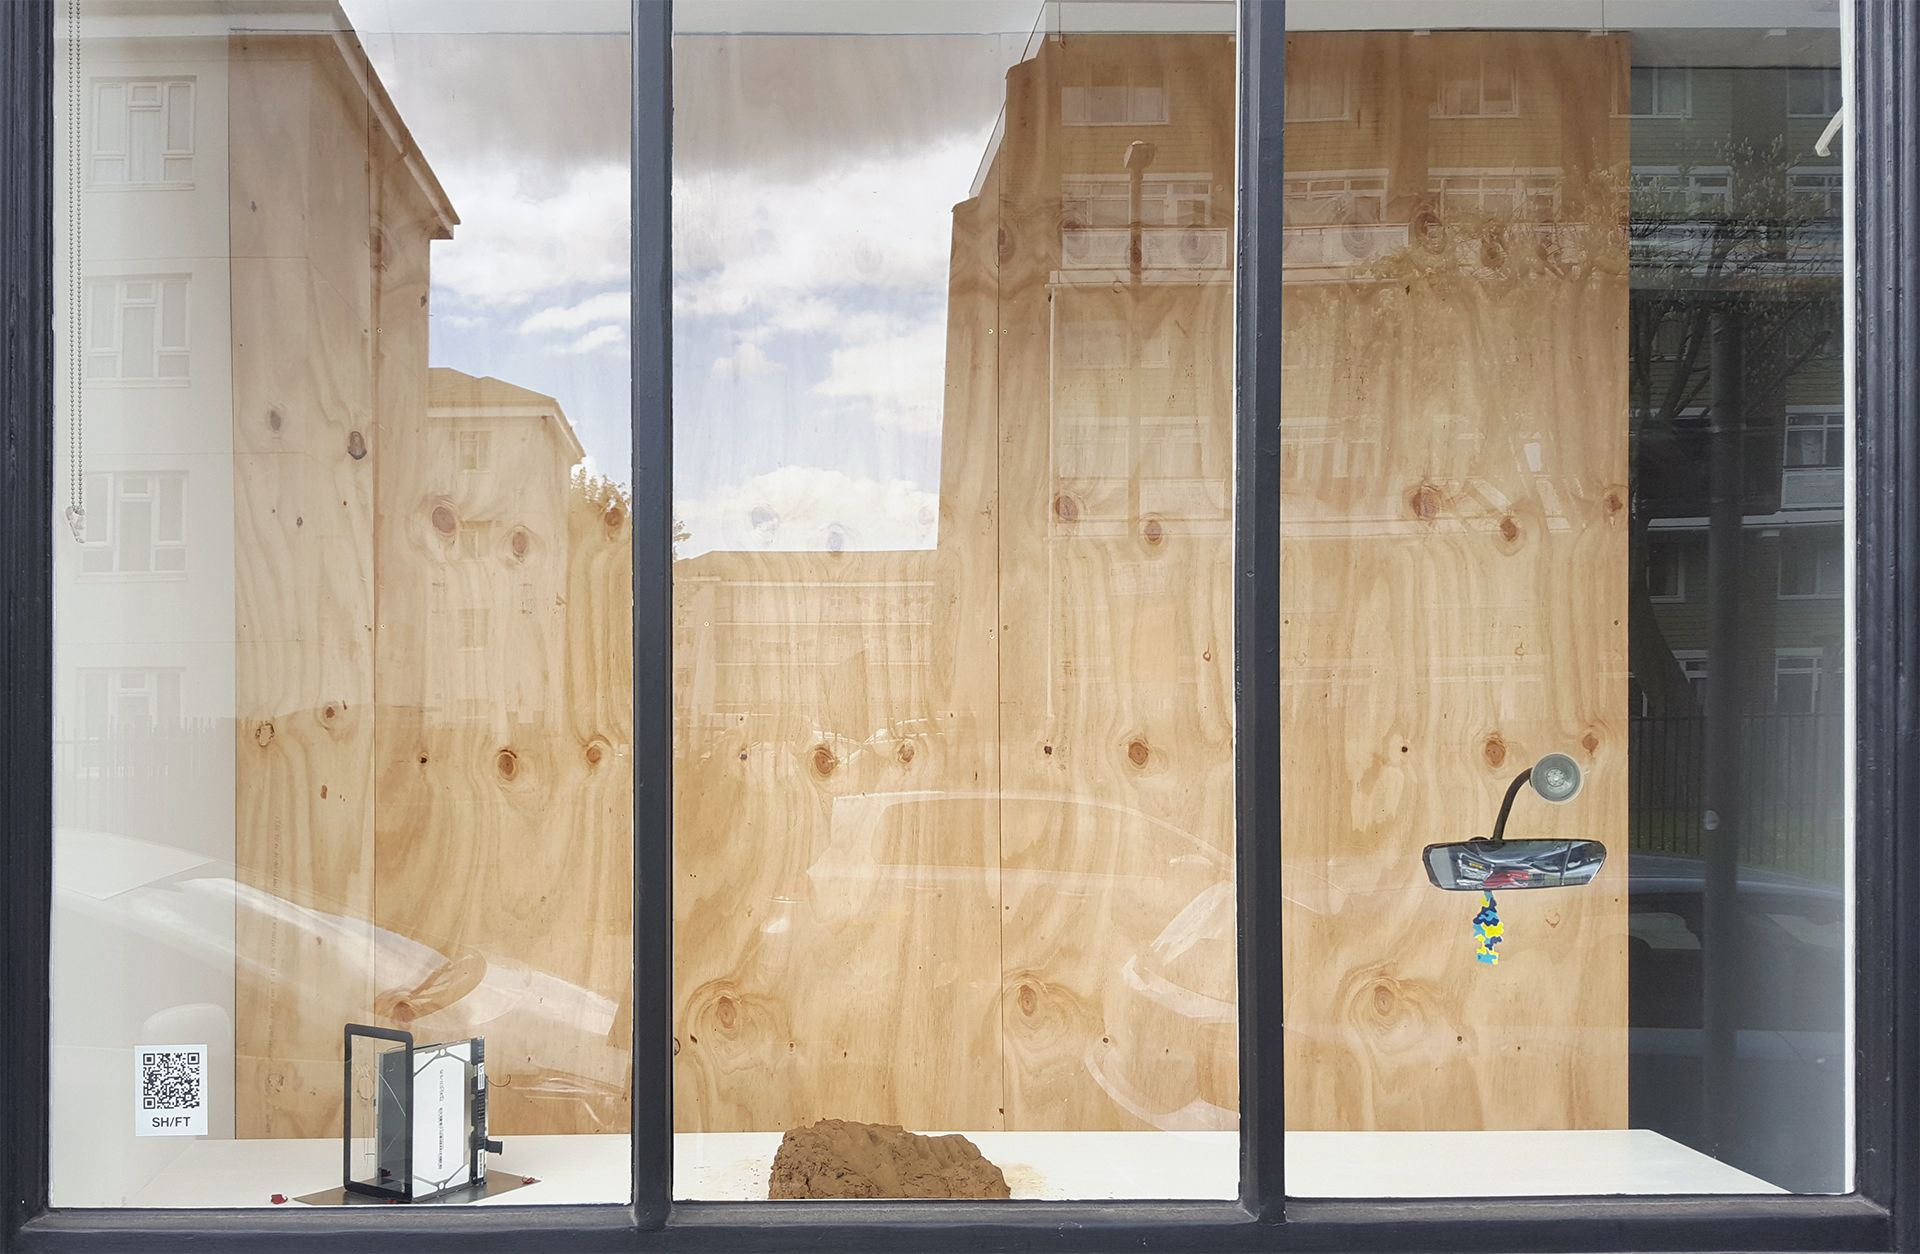 Davinia-Ann Robinson, Elisabeth Molin, Serra Tansel, SH/FT installation view, 2021